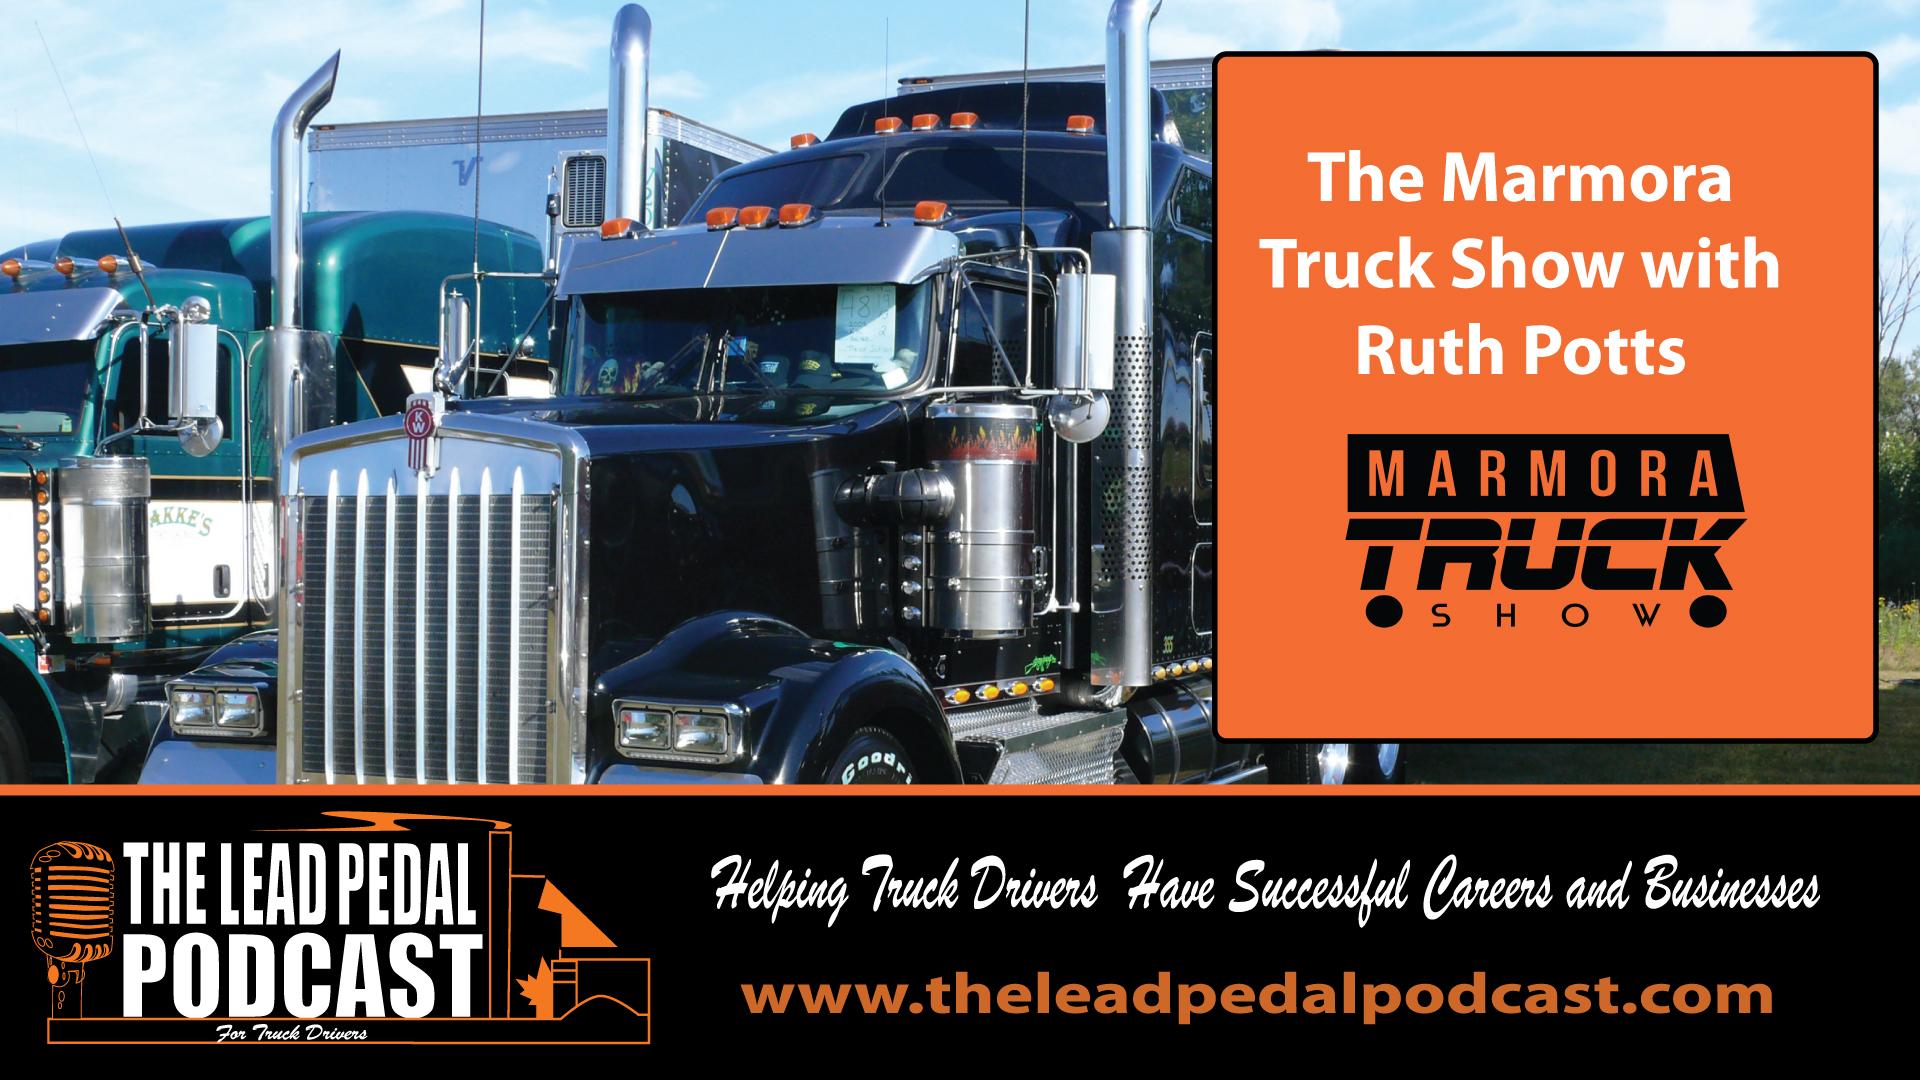 Marmora Truck Show